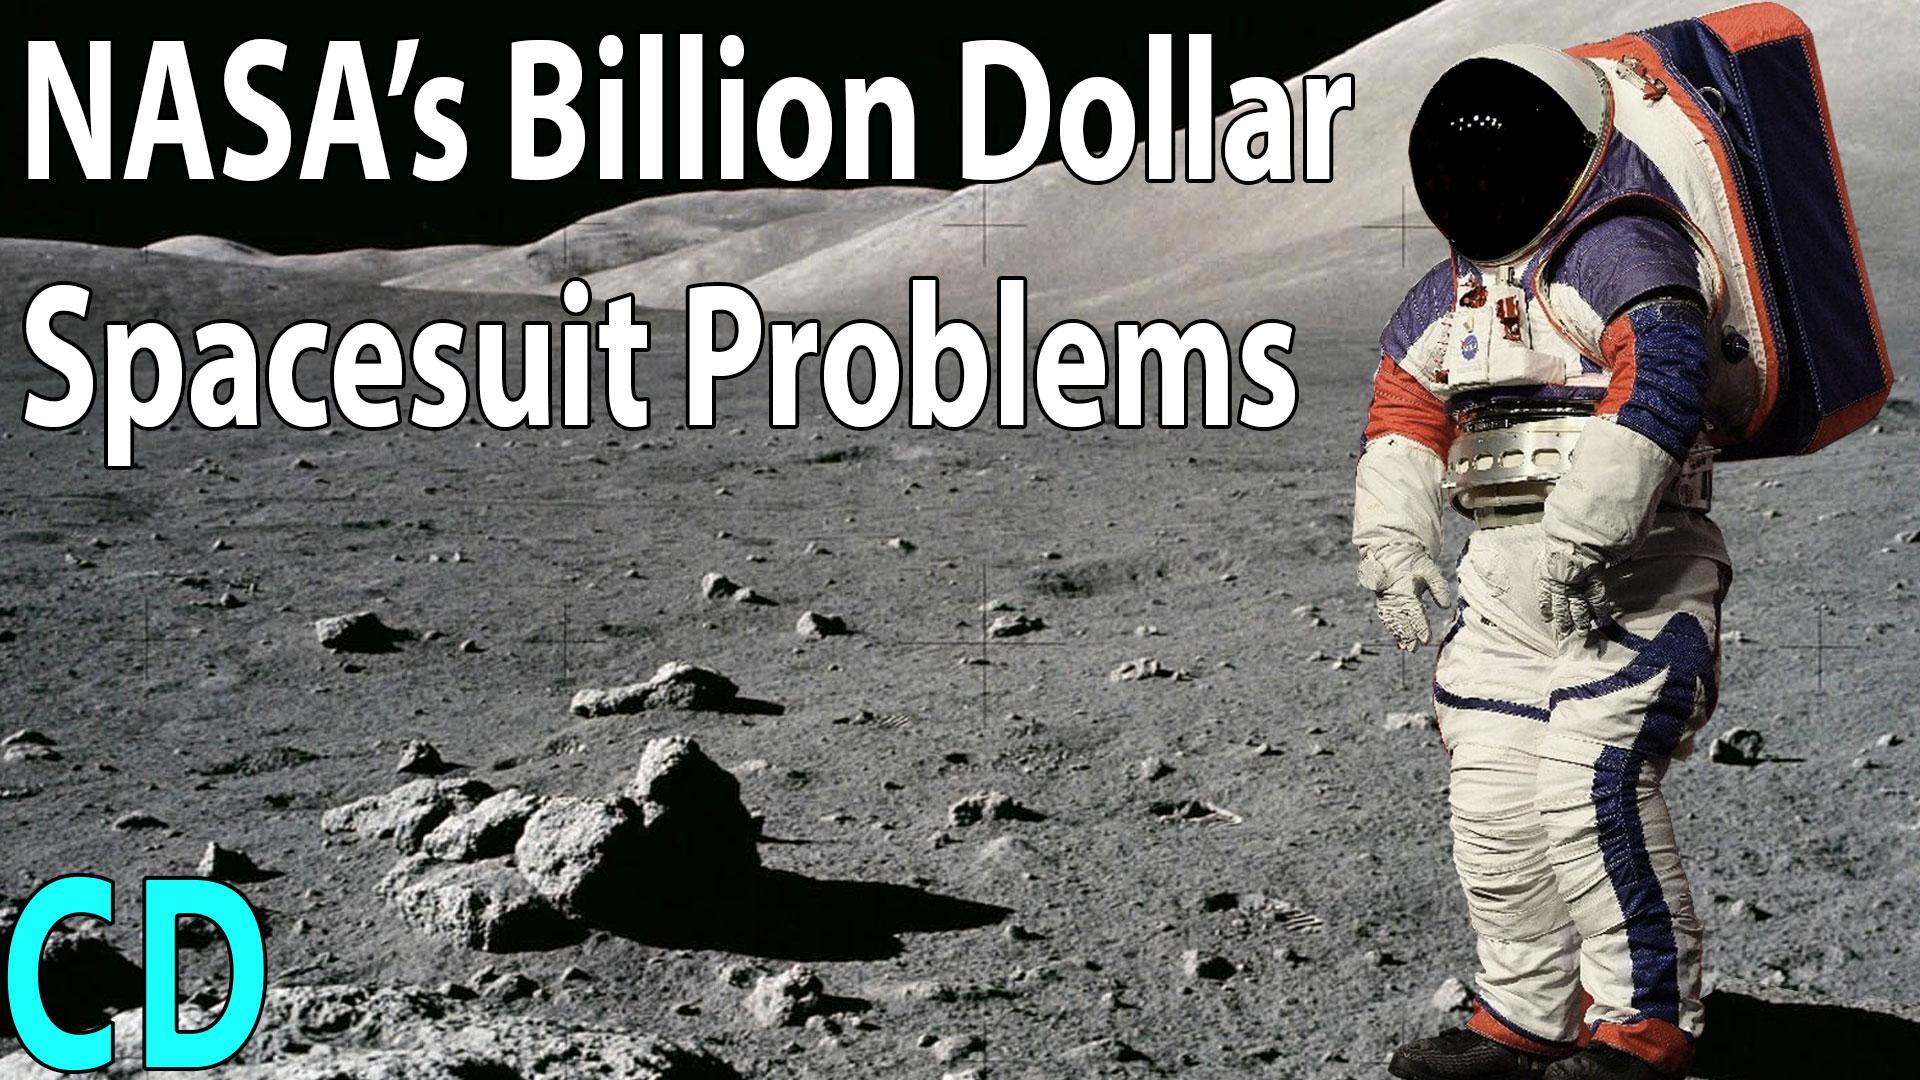 NASA's Billion Dollar Spacesuit Problems